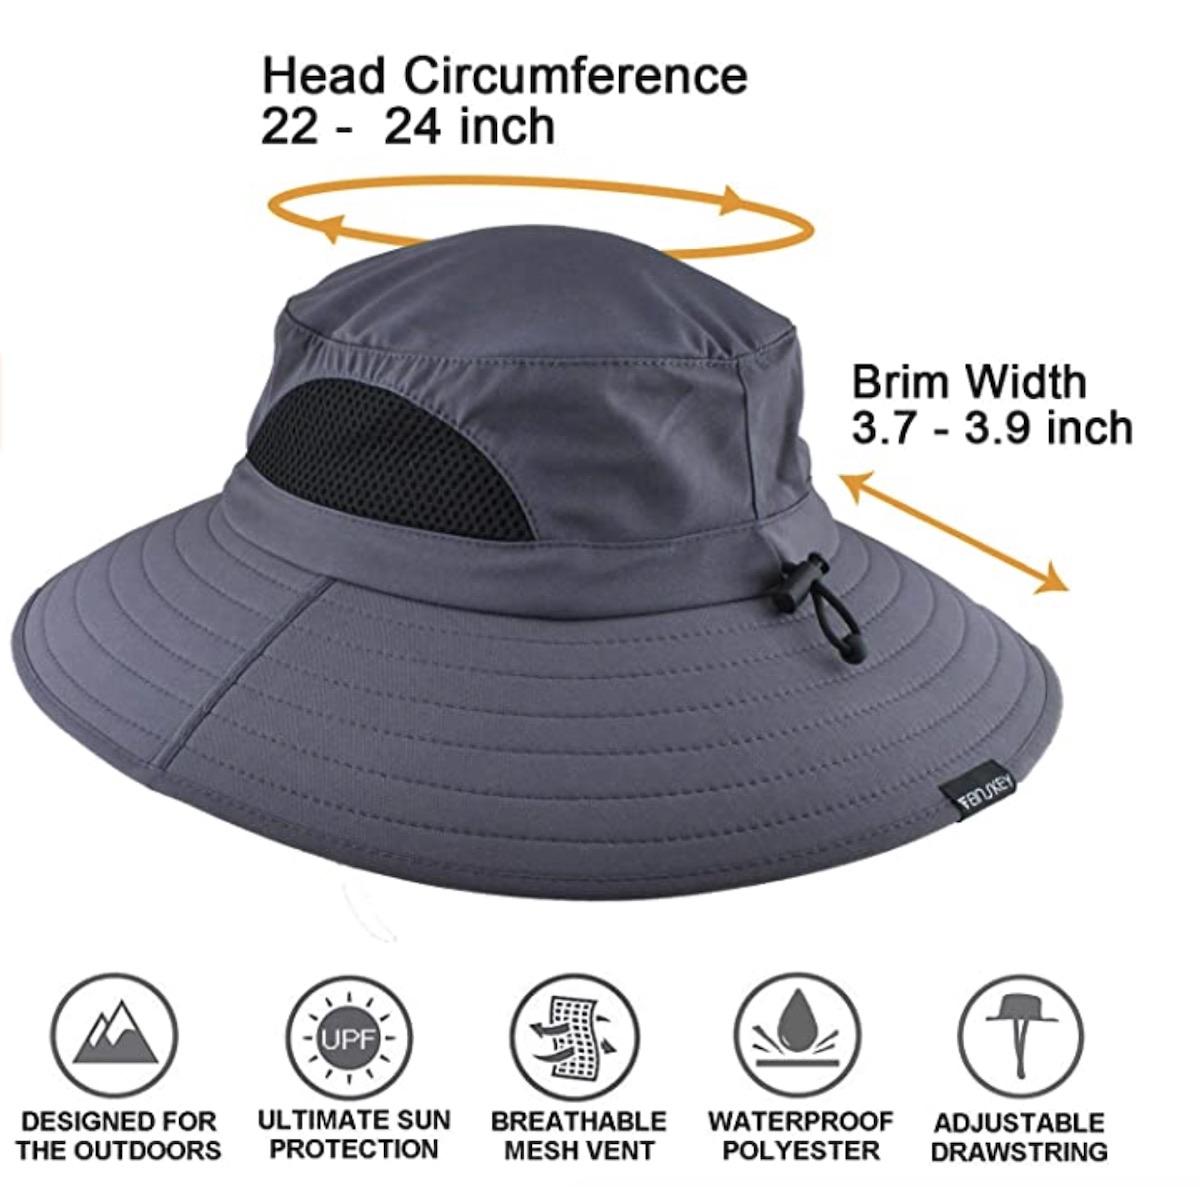 Sun Protection Wide Brim Bucket Hat Waterproof Breathable Packable Beach Hut